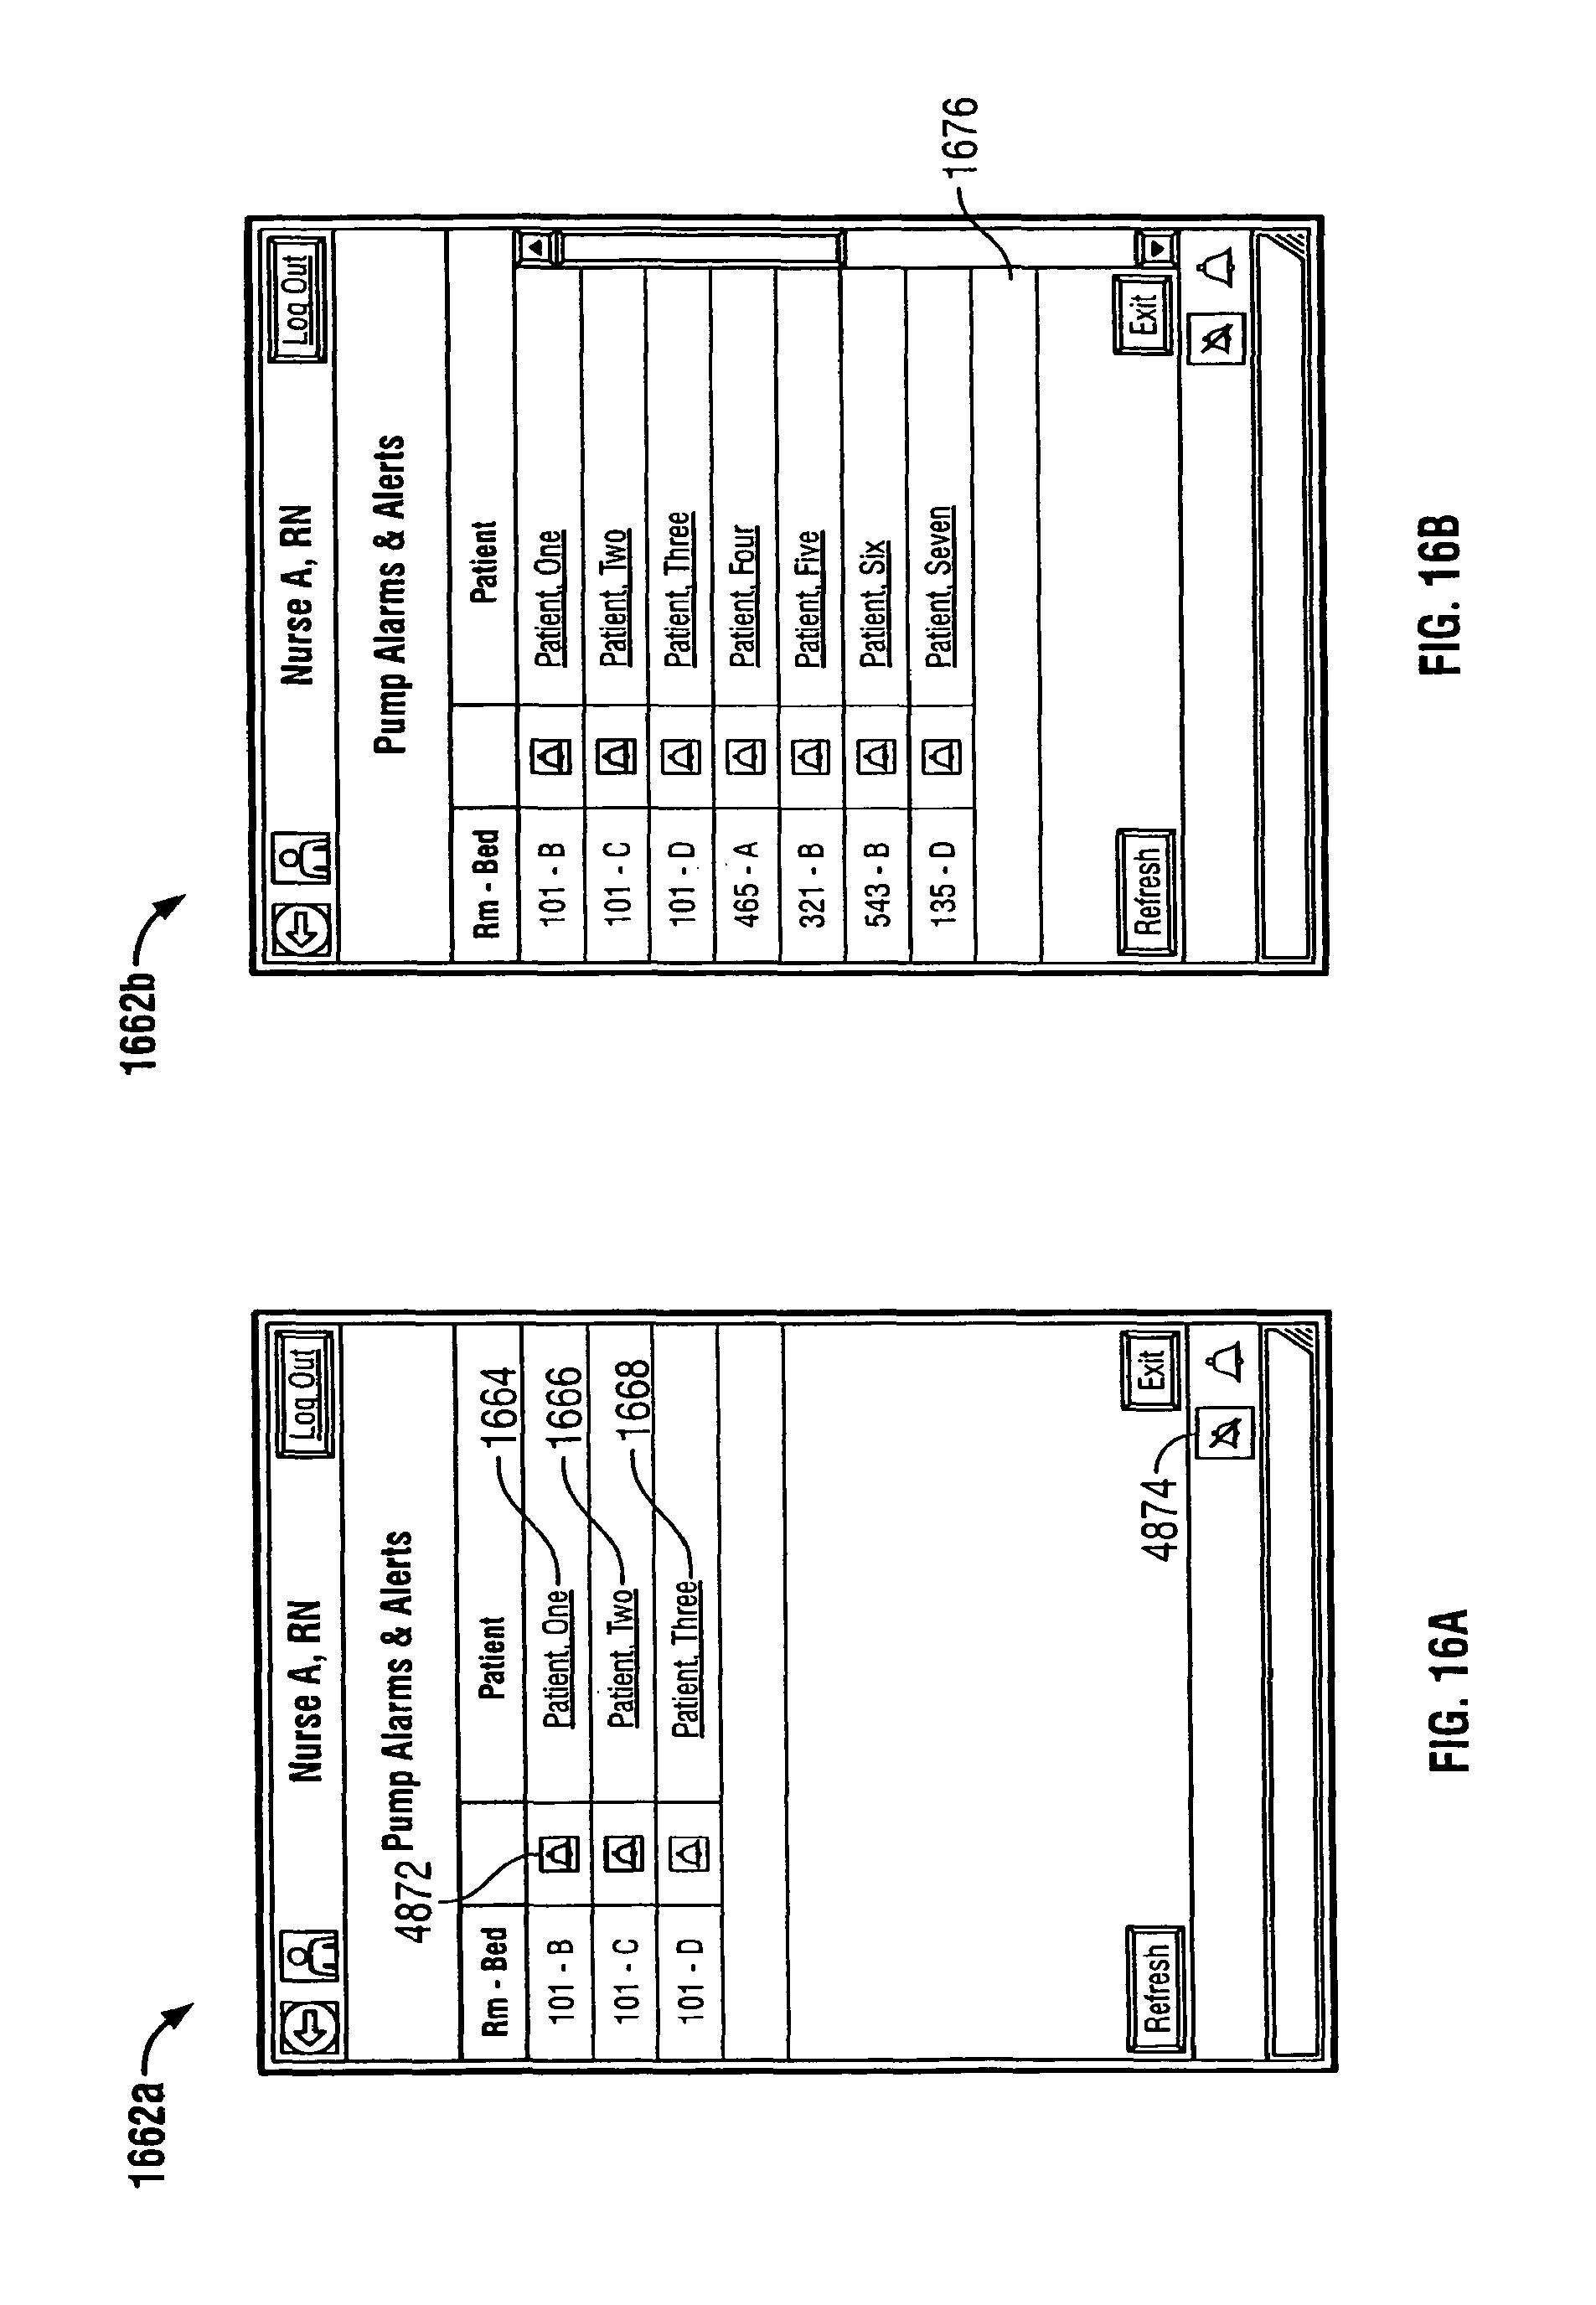 Patent US 10,173,008 B2